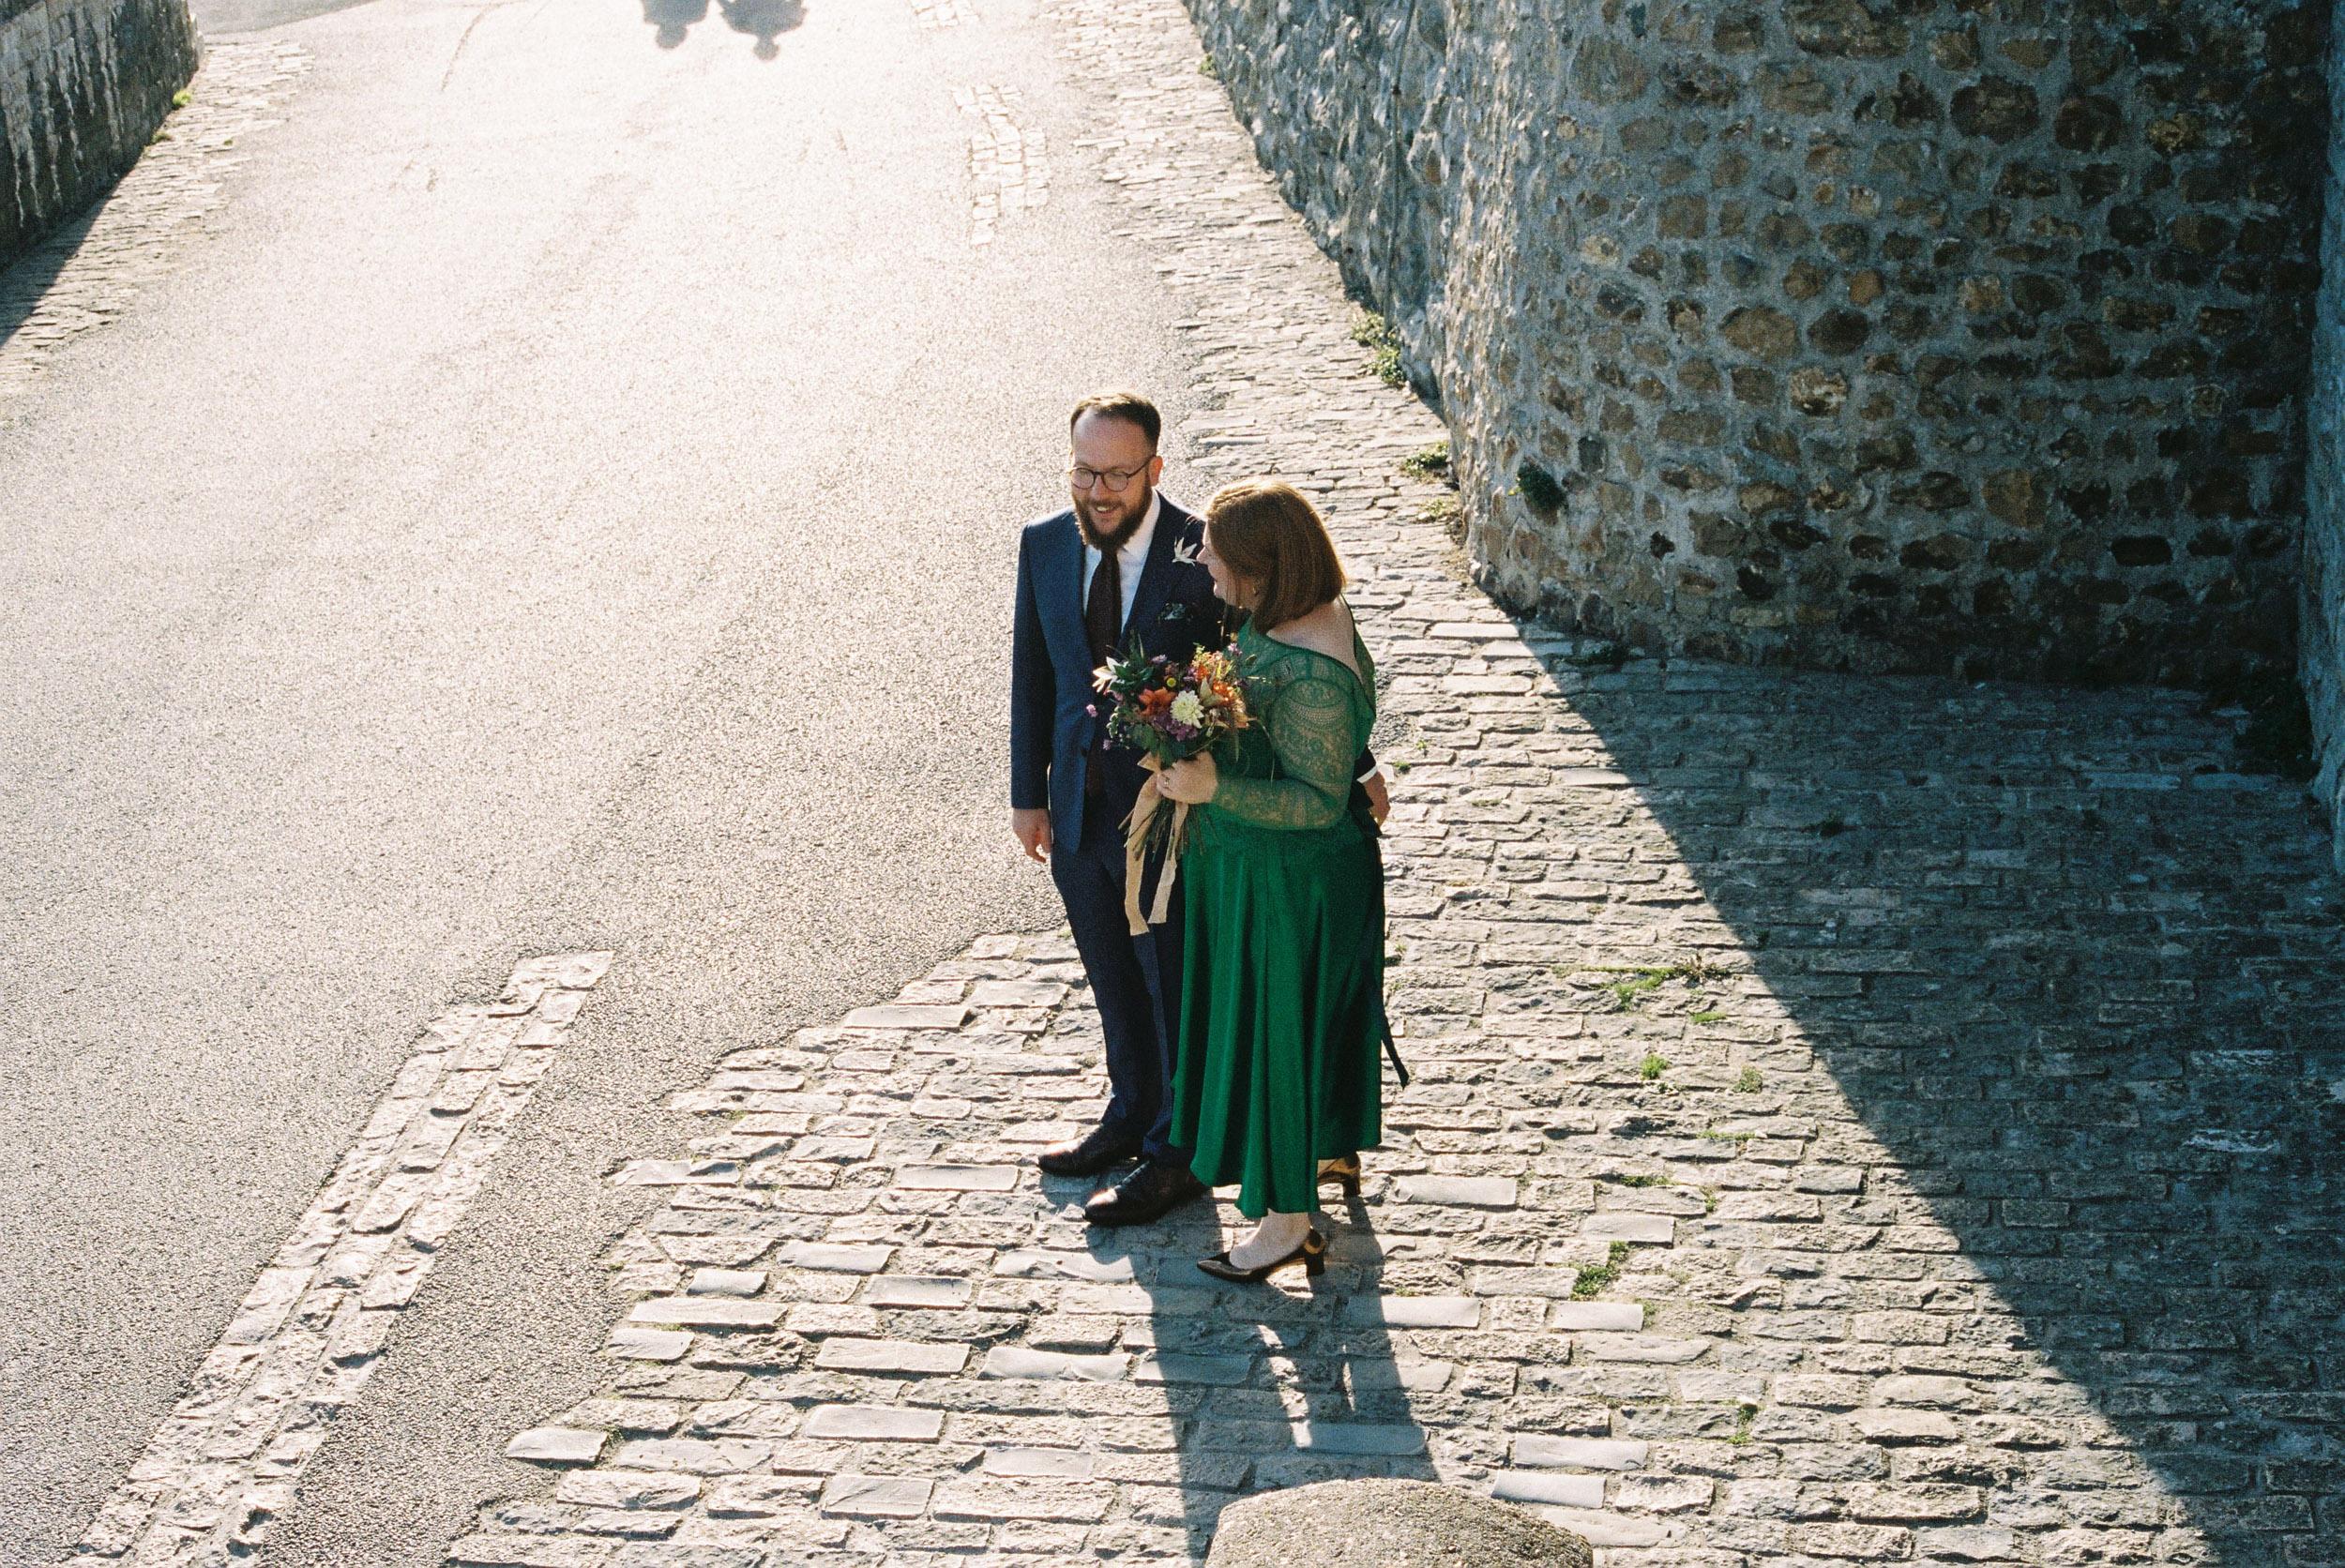 Lucy-Bespoke-Green-Silk-Lace-Wedding-Dress-Kate-Beaumont-Sheffield-17.jpg